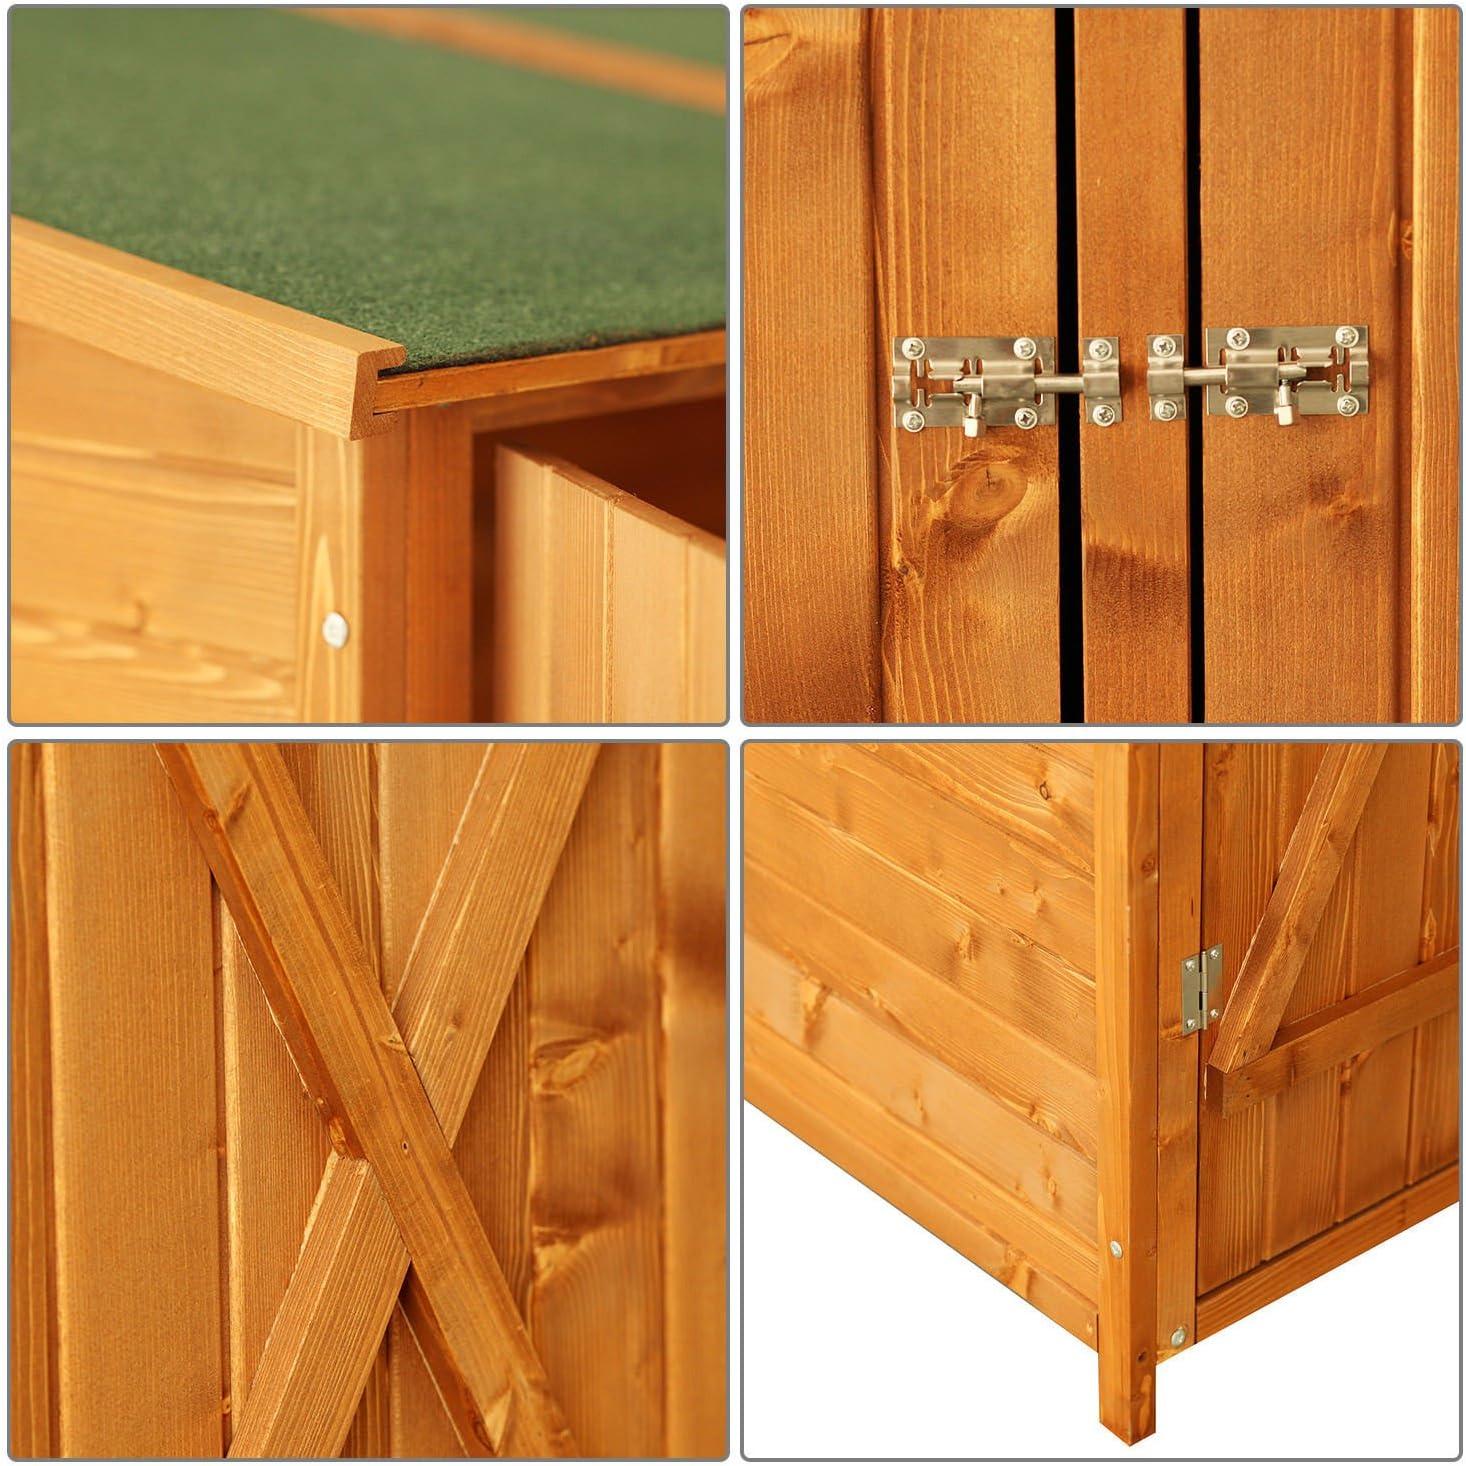 Outsunny - Caseta de madera para exterior - Ideal para el ...